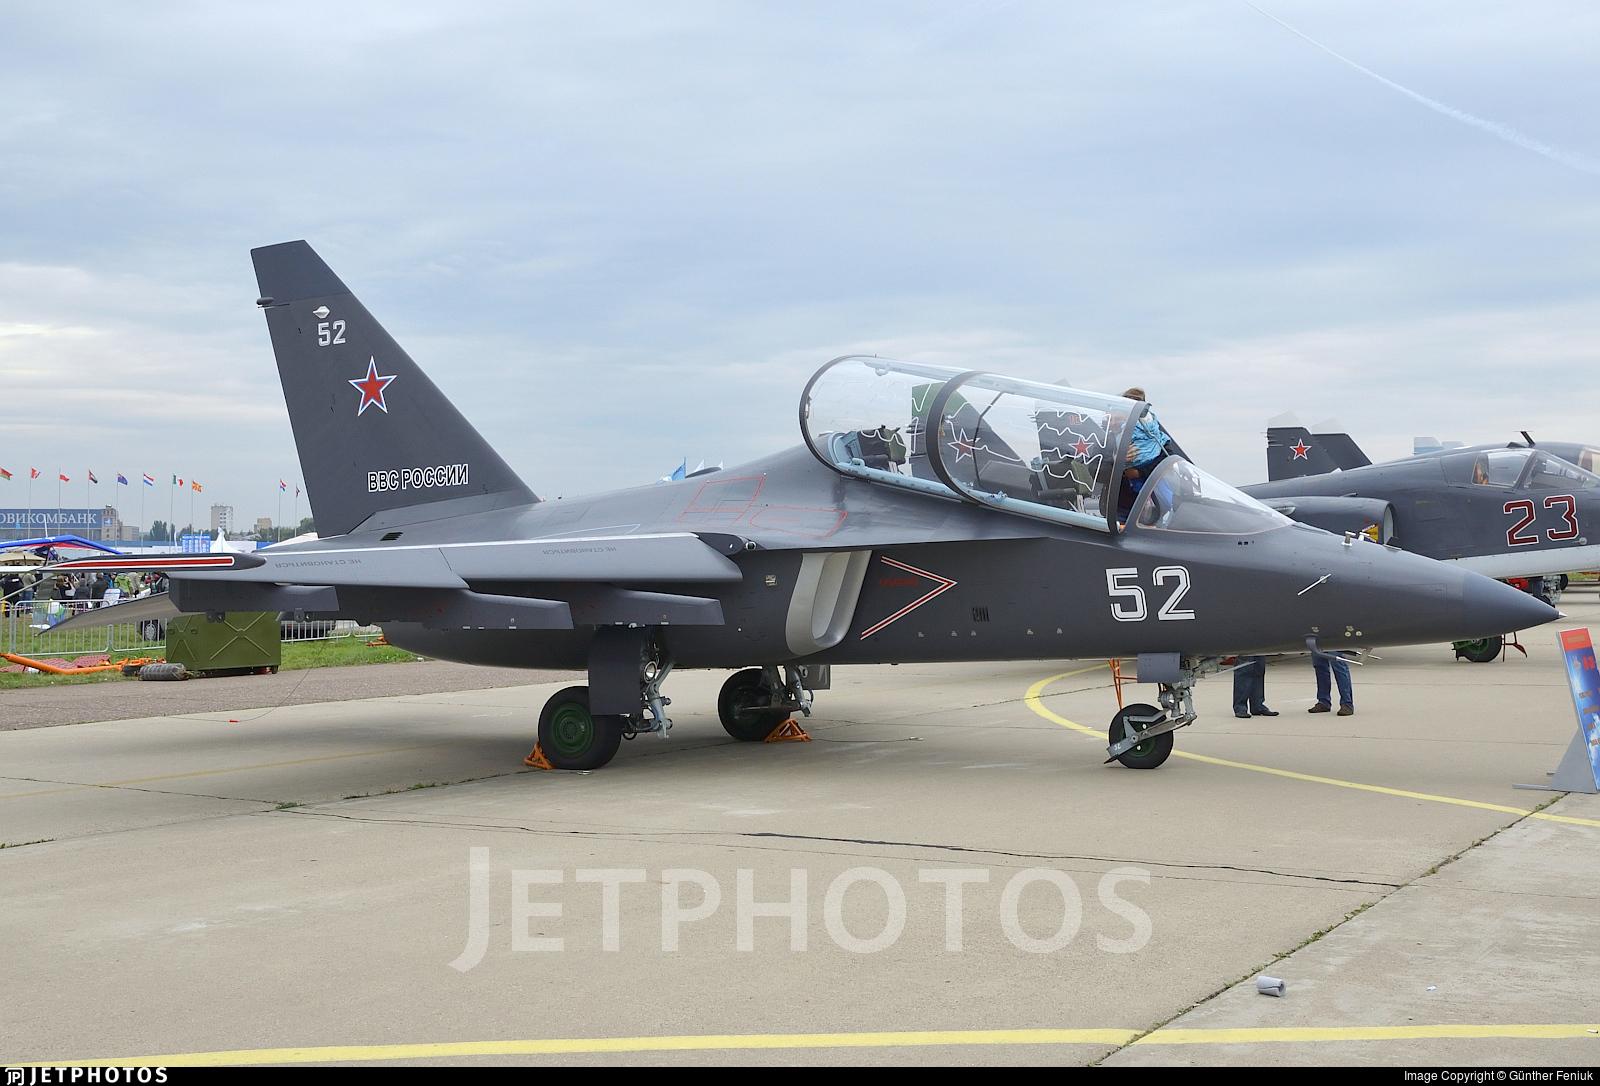 52 - Yakovlev Yak-130 - Russia - Air Force